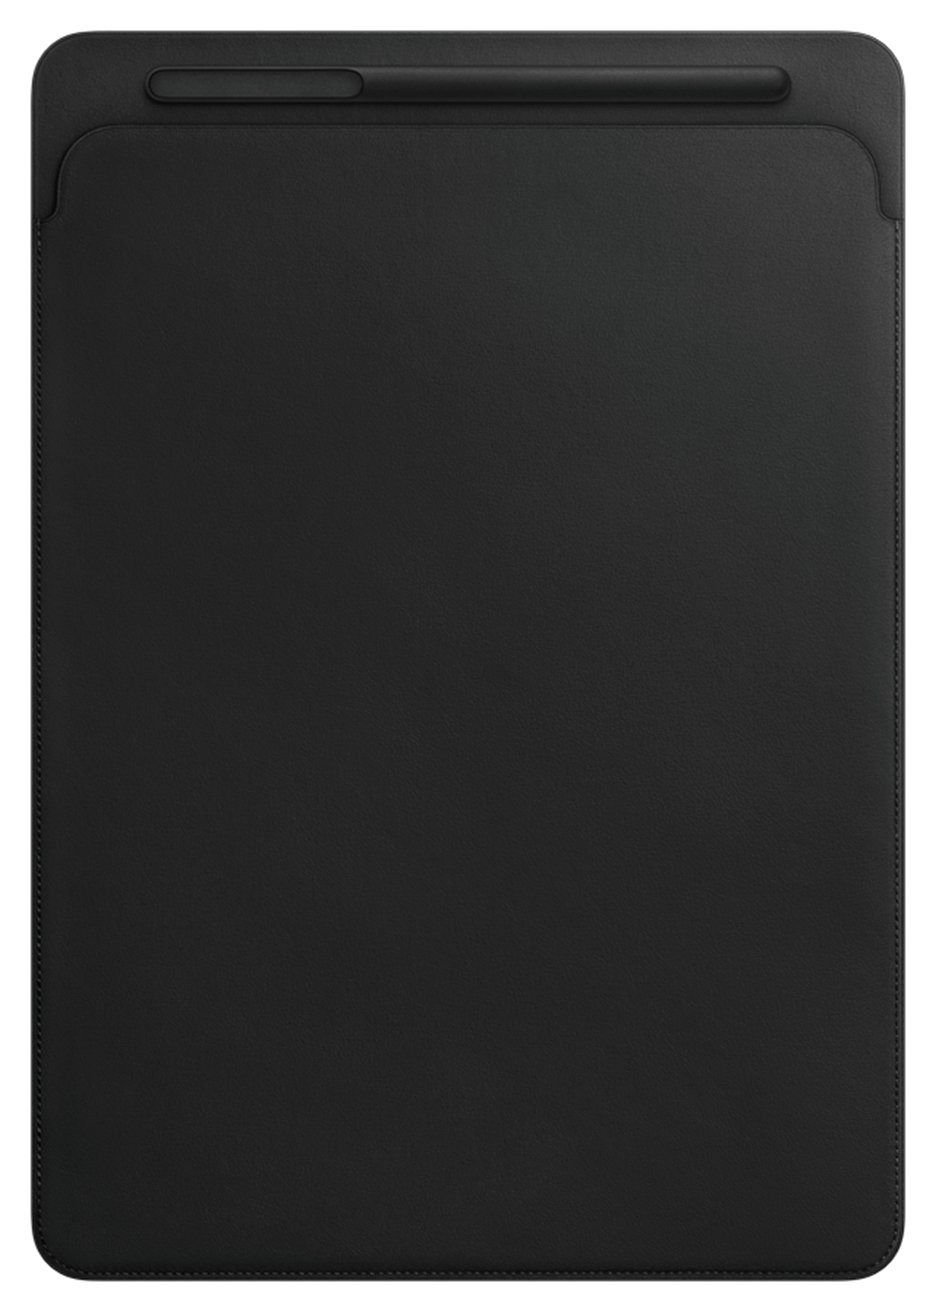 Image of Apple 12.9 Inch iPad Pro Leather Sleeve - Black